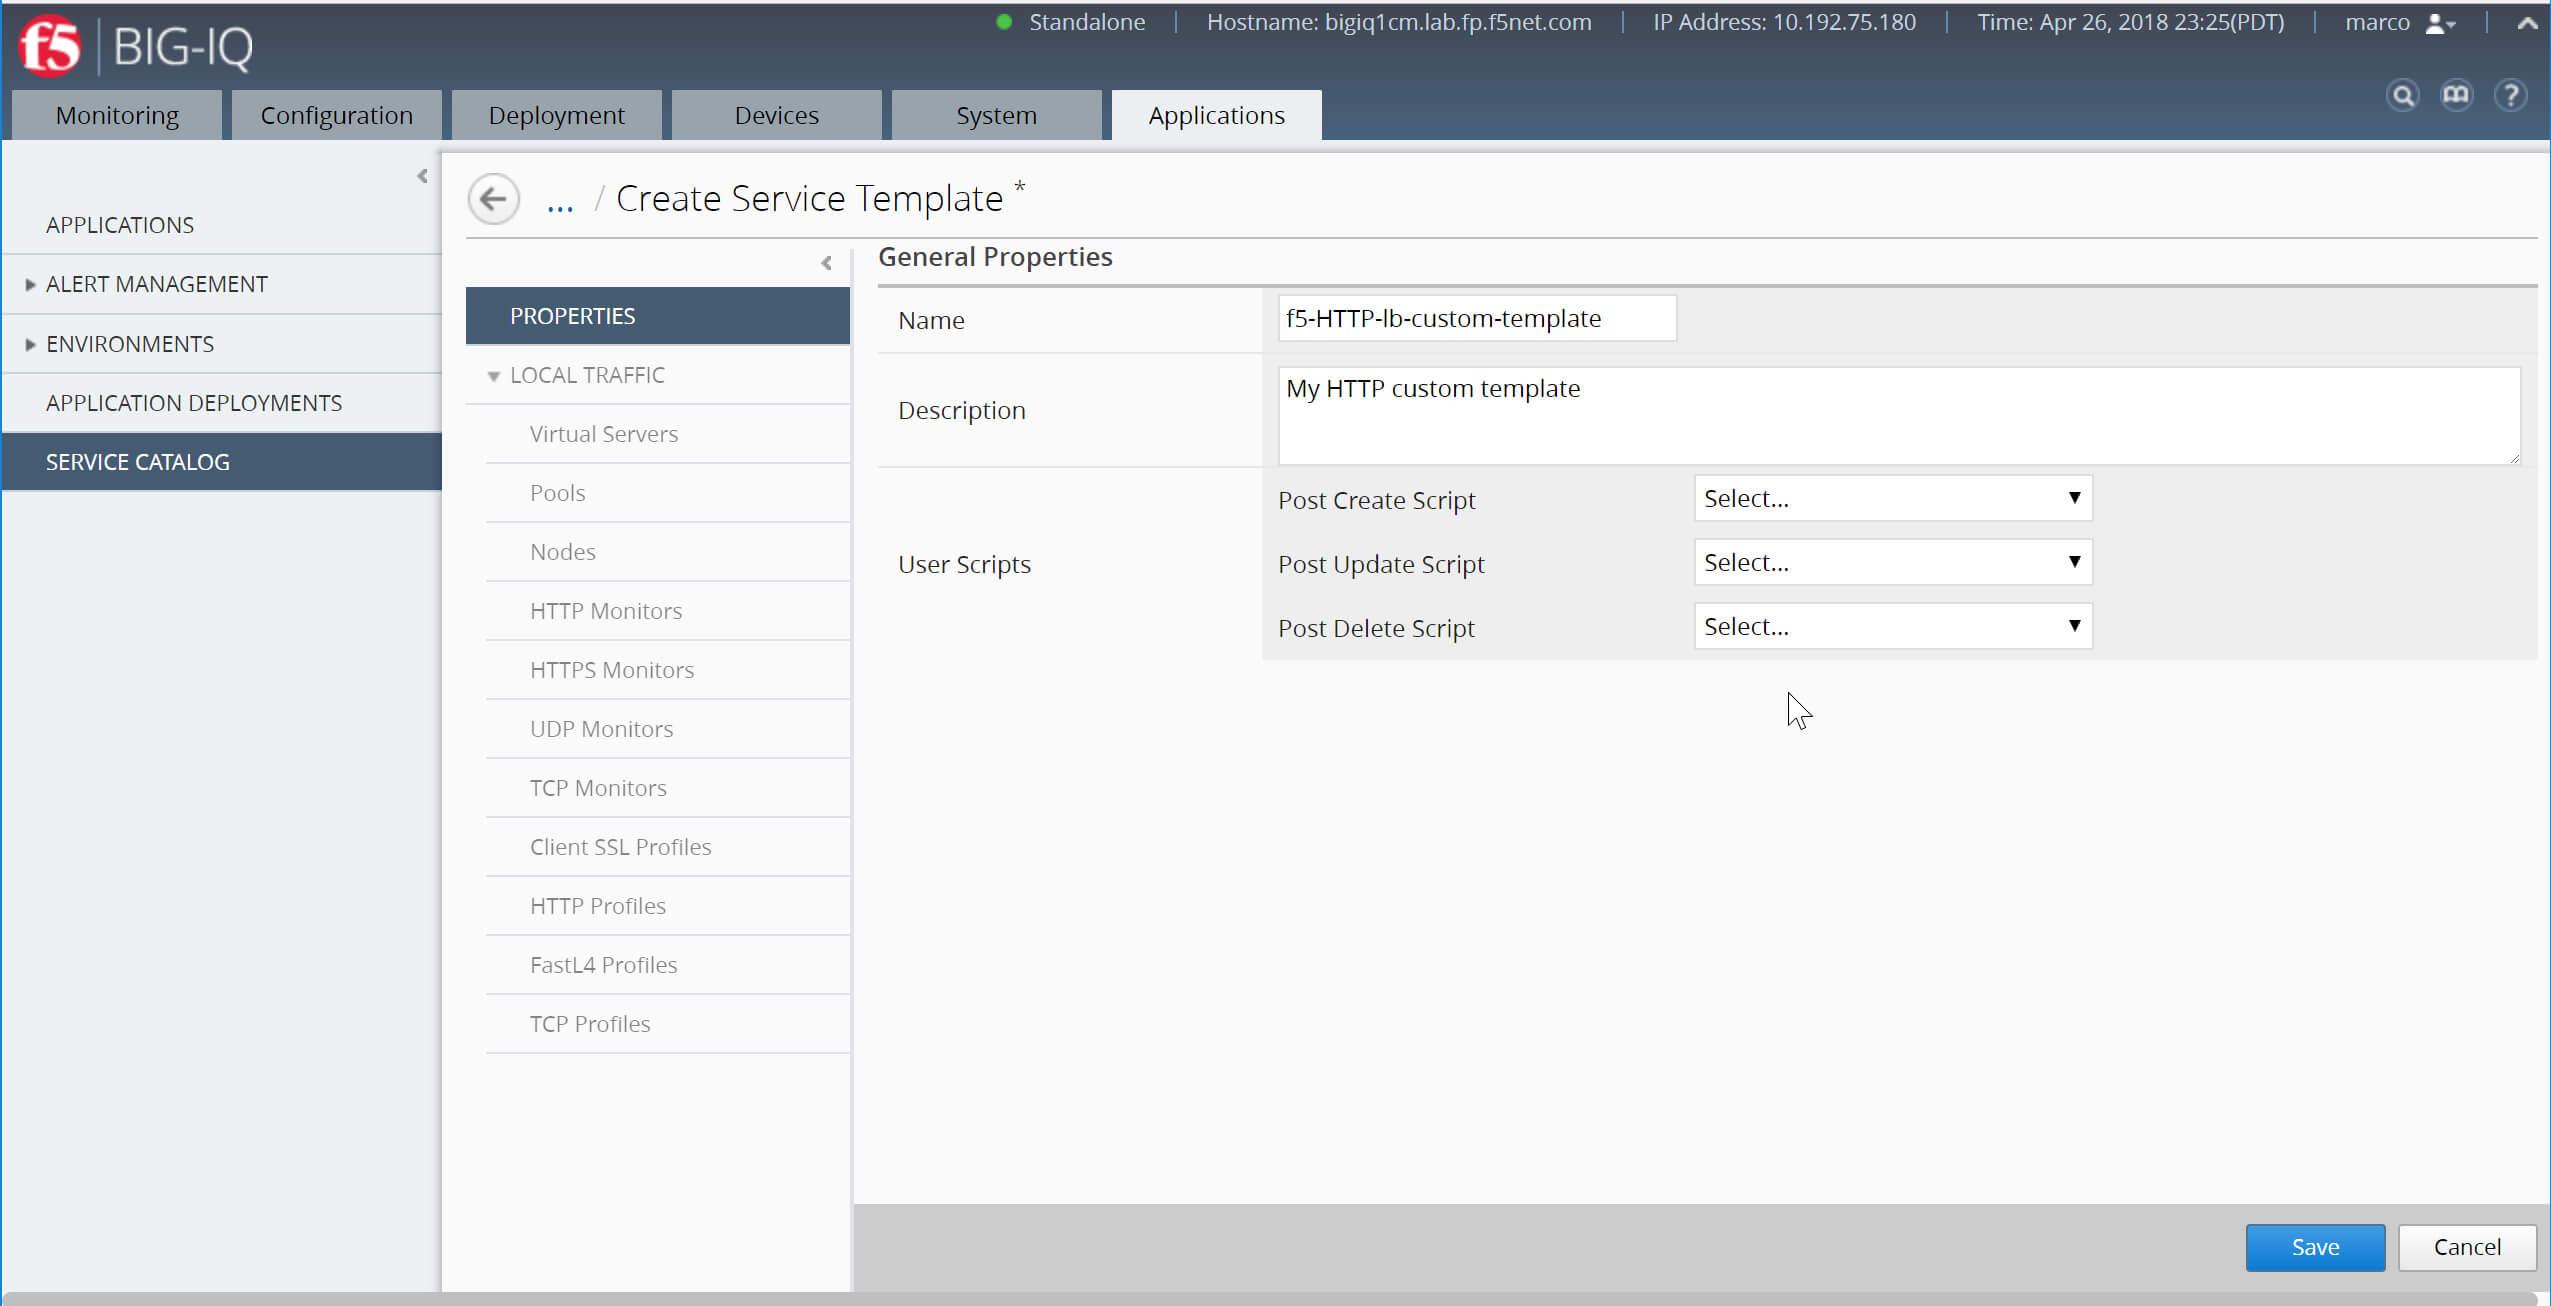 Lab 4.1: Custom Service Template With Iq Certificate Template